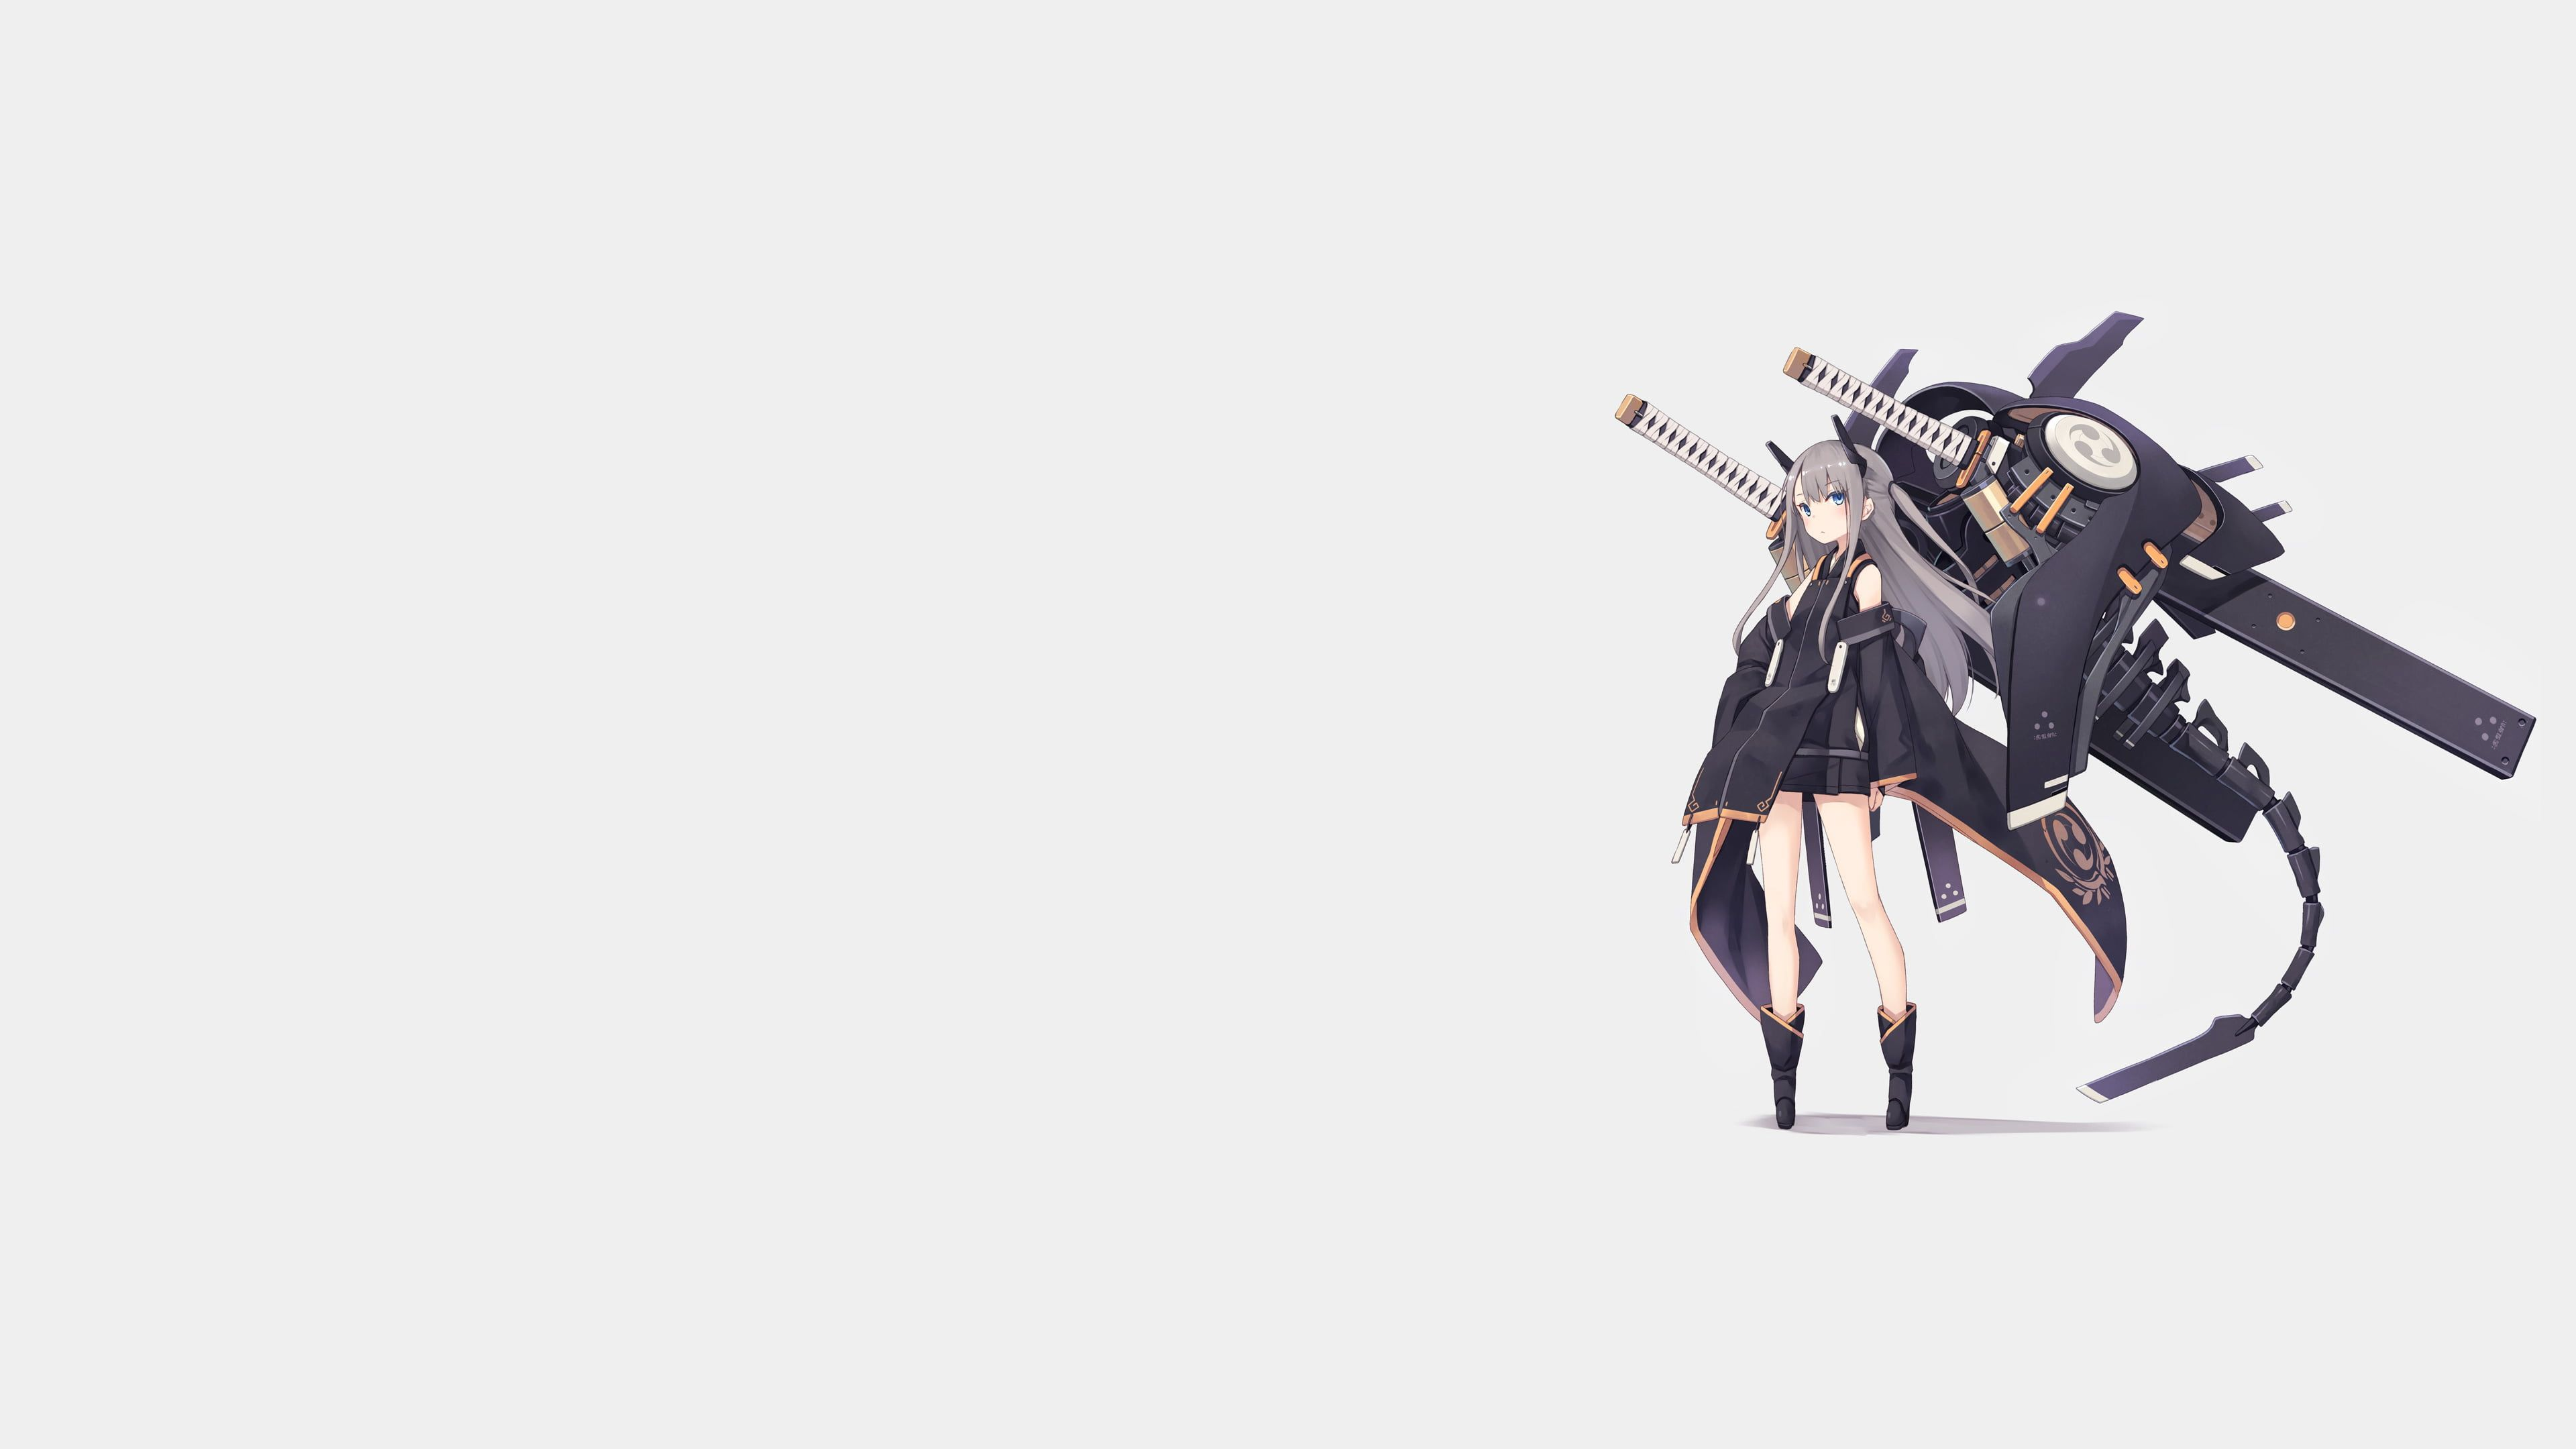 Pin On Anime Anime minimalist wallpaper 4k